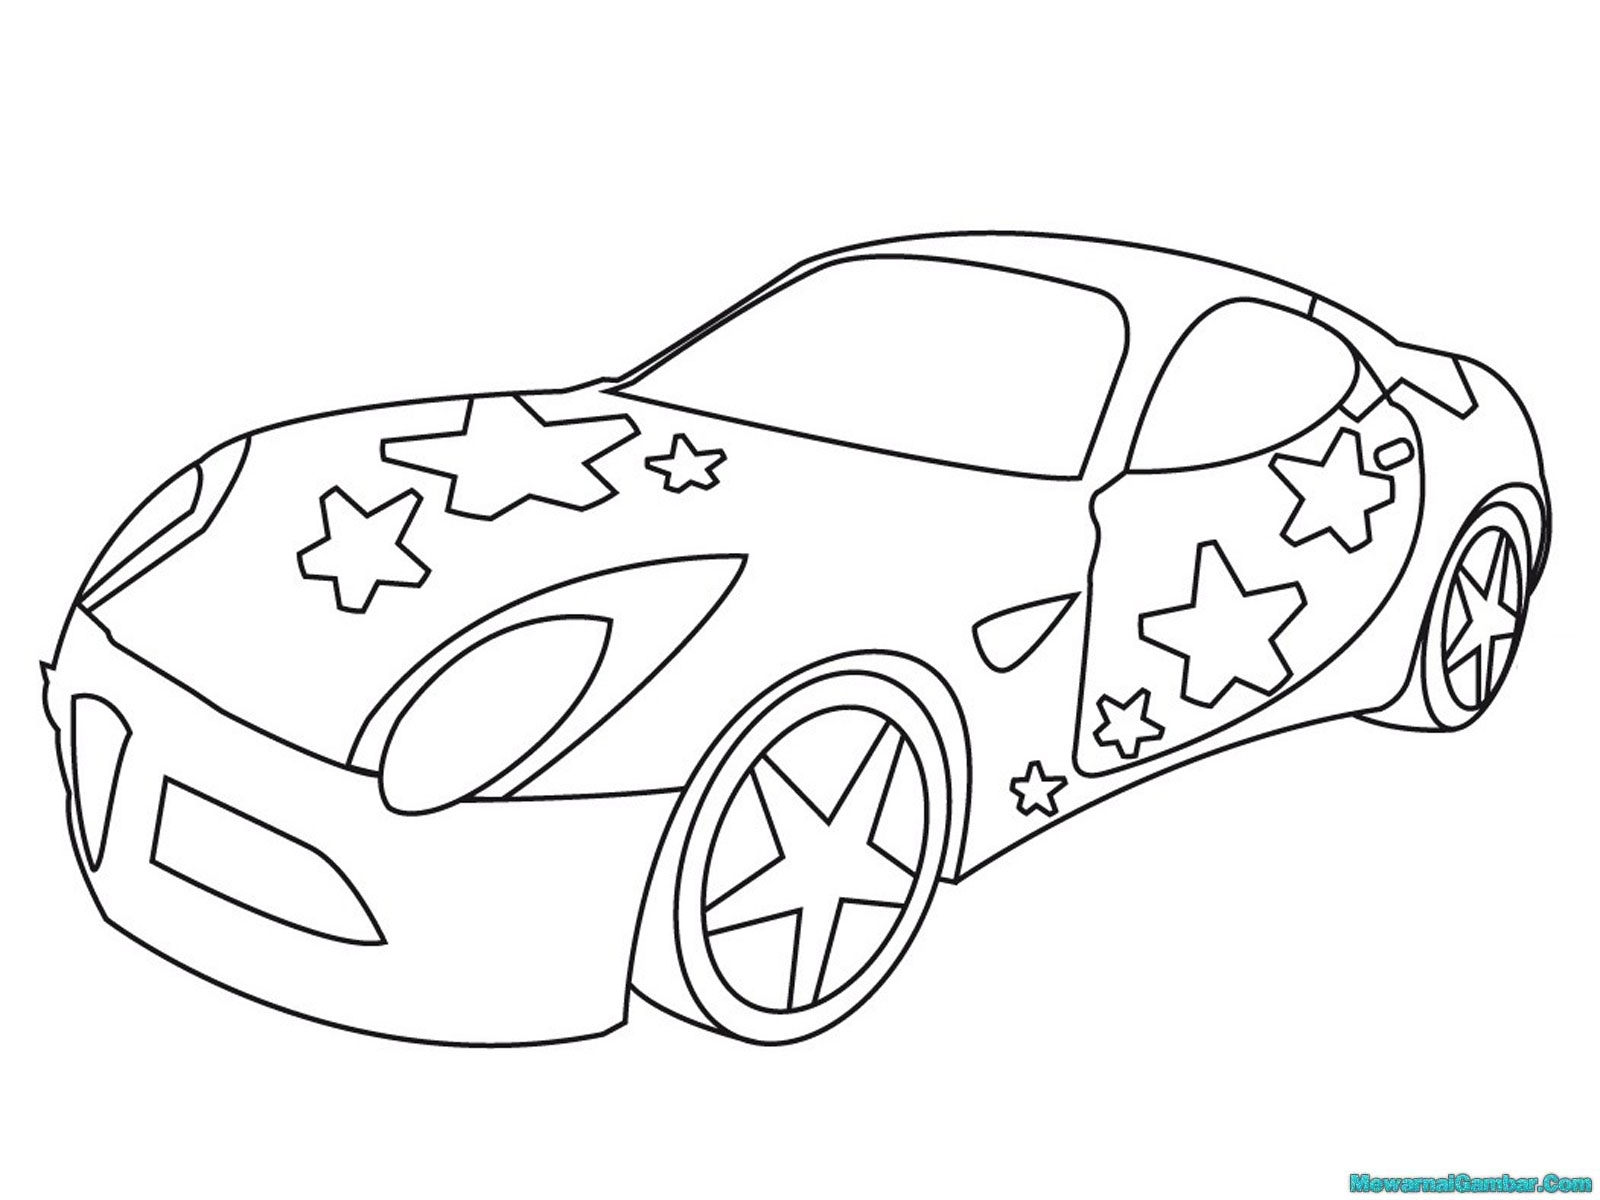 Gambar Gambar Mewarnai Blaze Monster Machines Belajar Mobil Balap